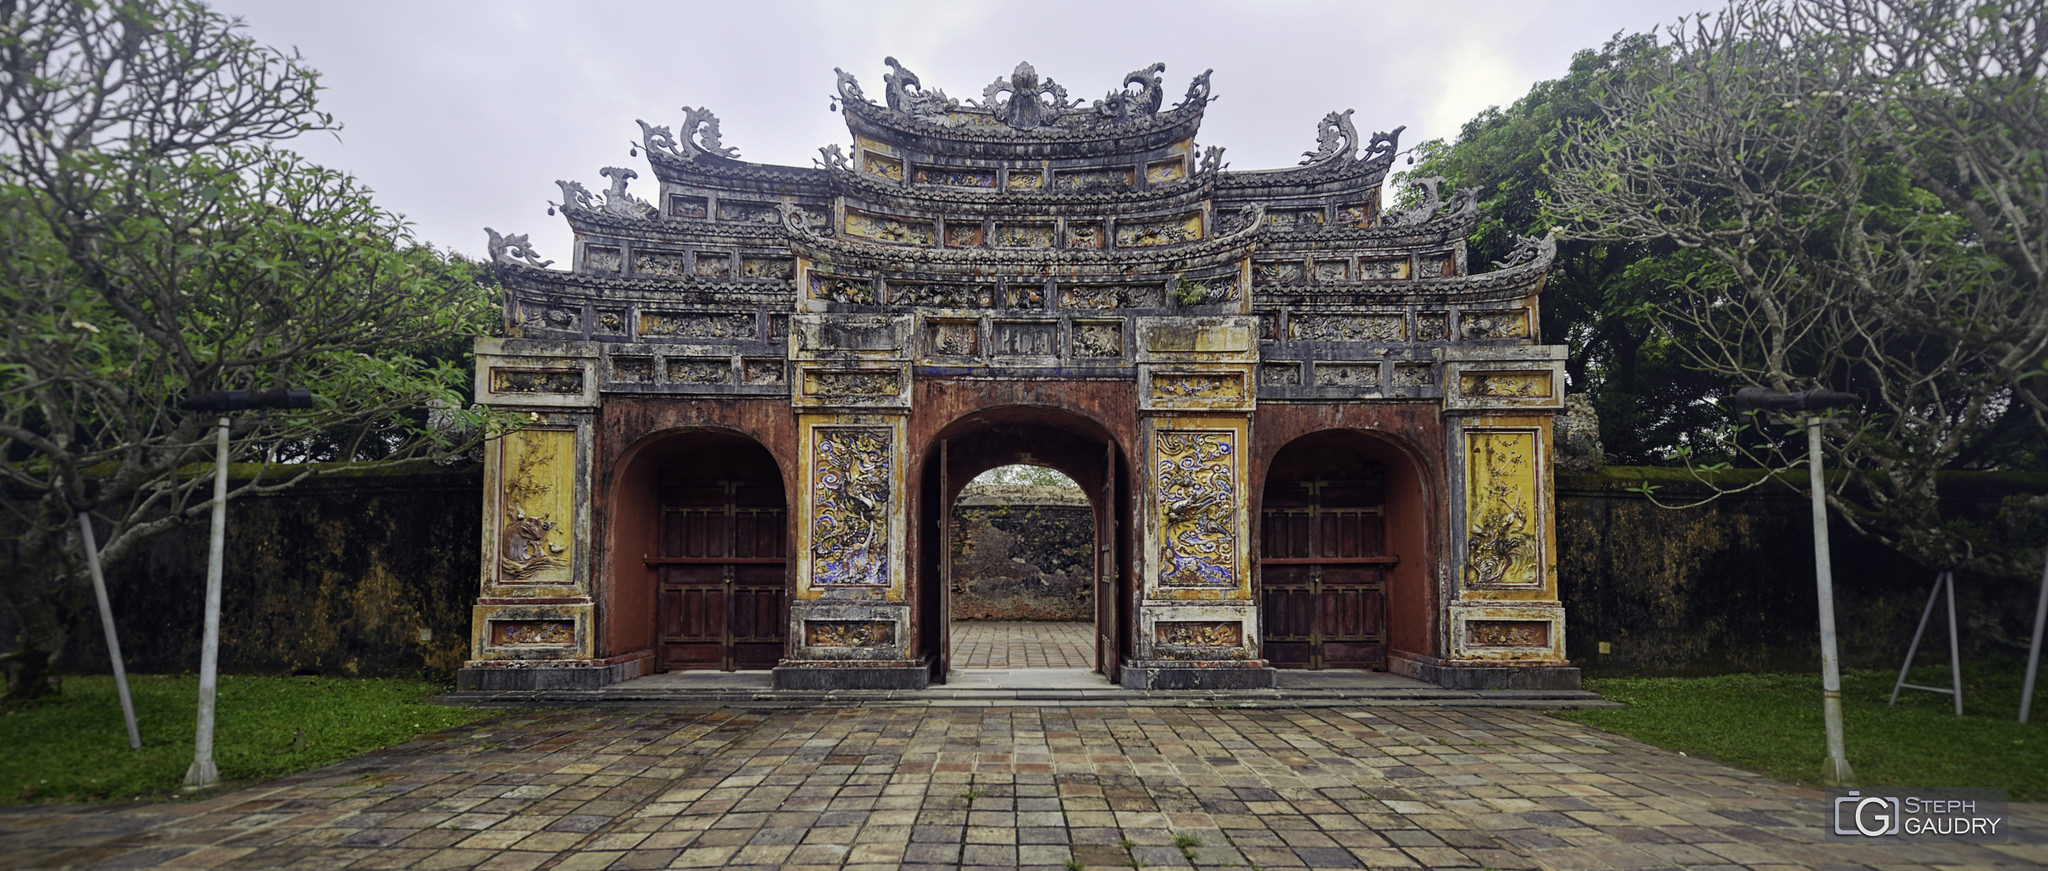 Kinh thành Huế  2018_04_16_164144 [Klik om de diavoorstelling te starten]